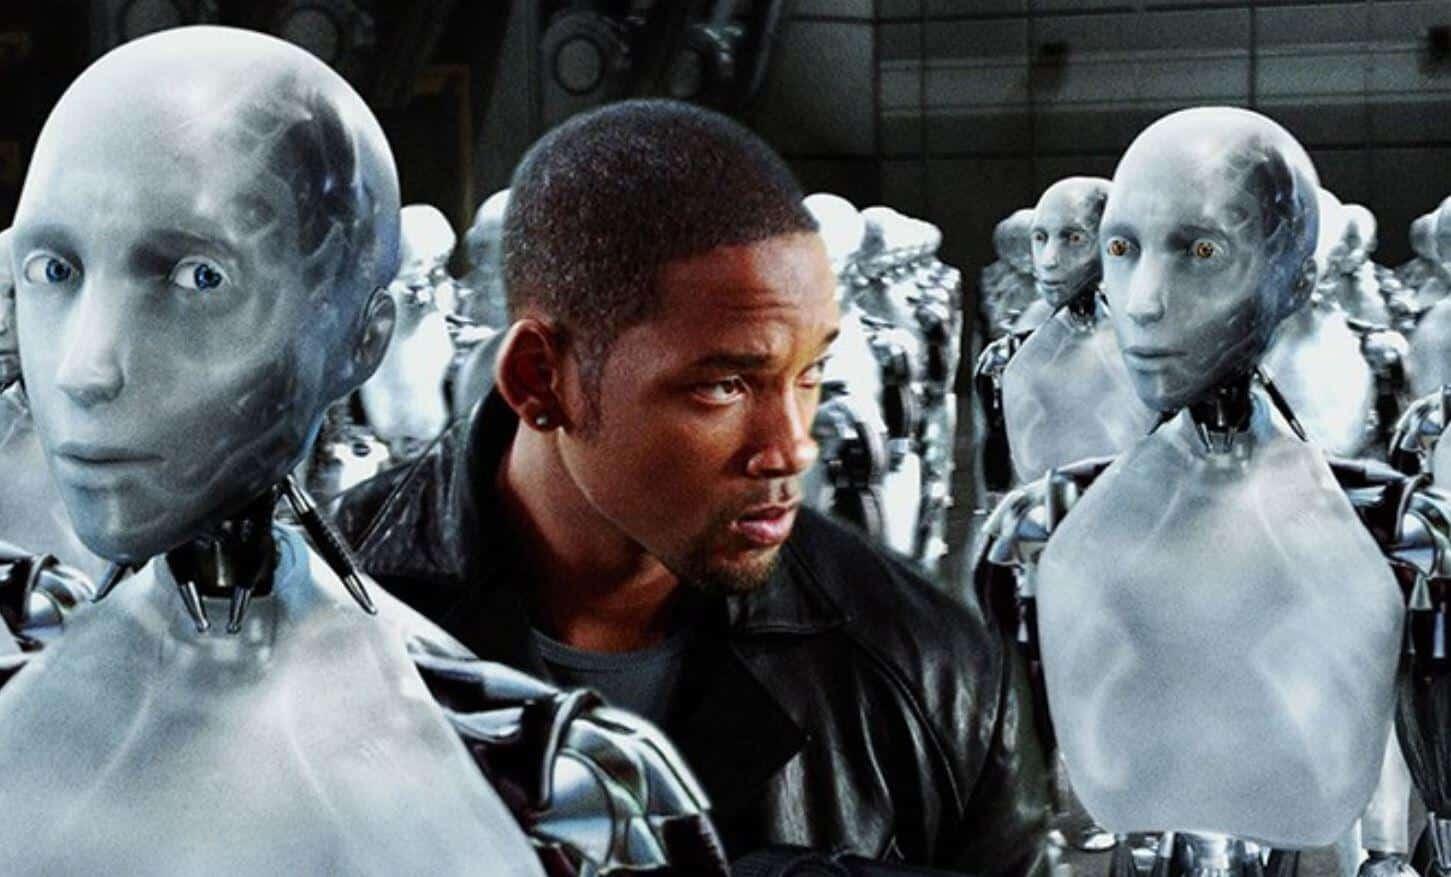 Robots Racism